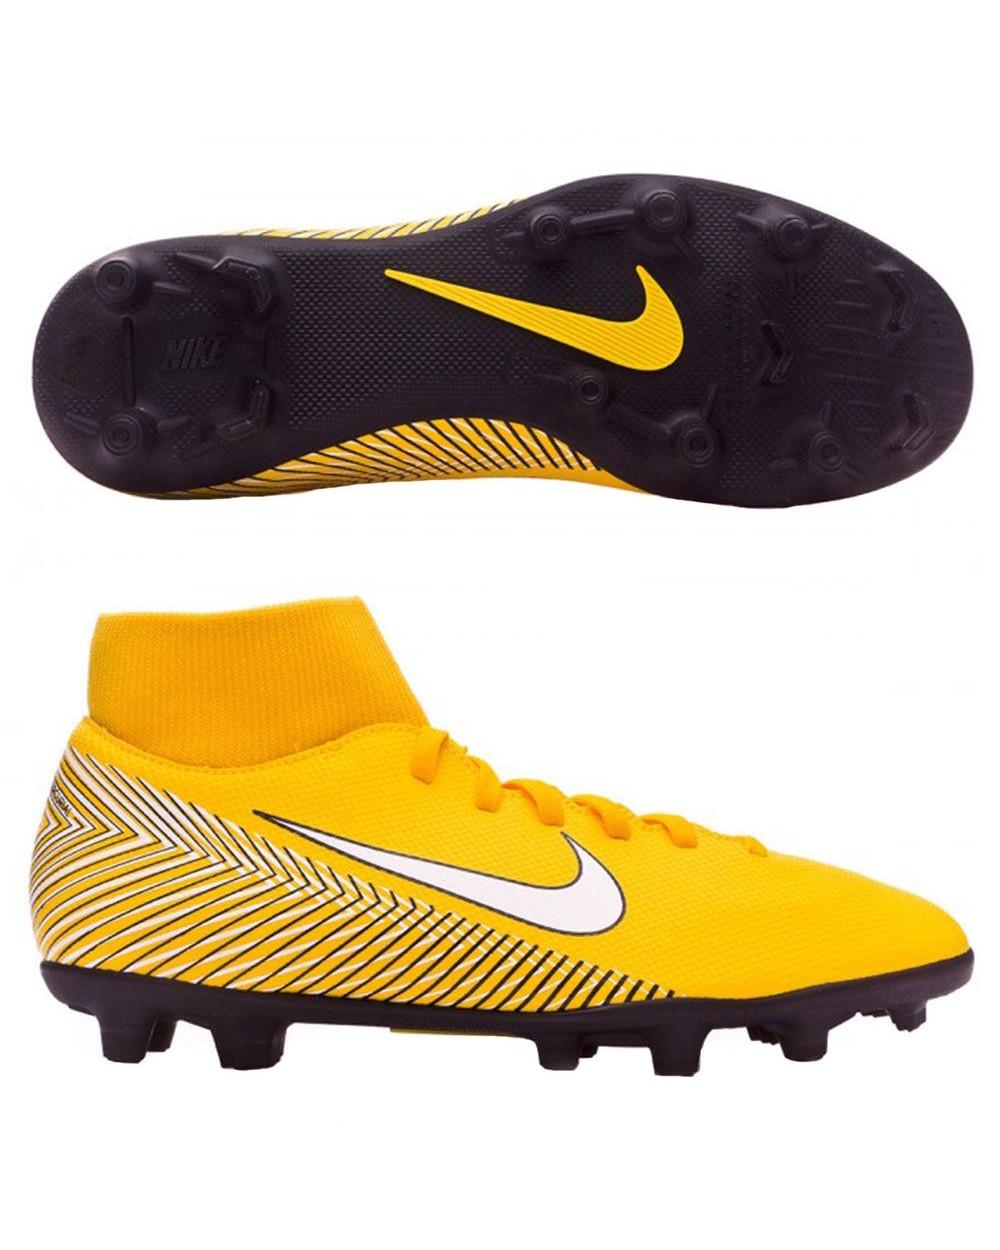 Neymar Mg Arancione Mercurial Calcio Scarpe Nike Con Club Superfly 6 XkPTuOZi